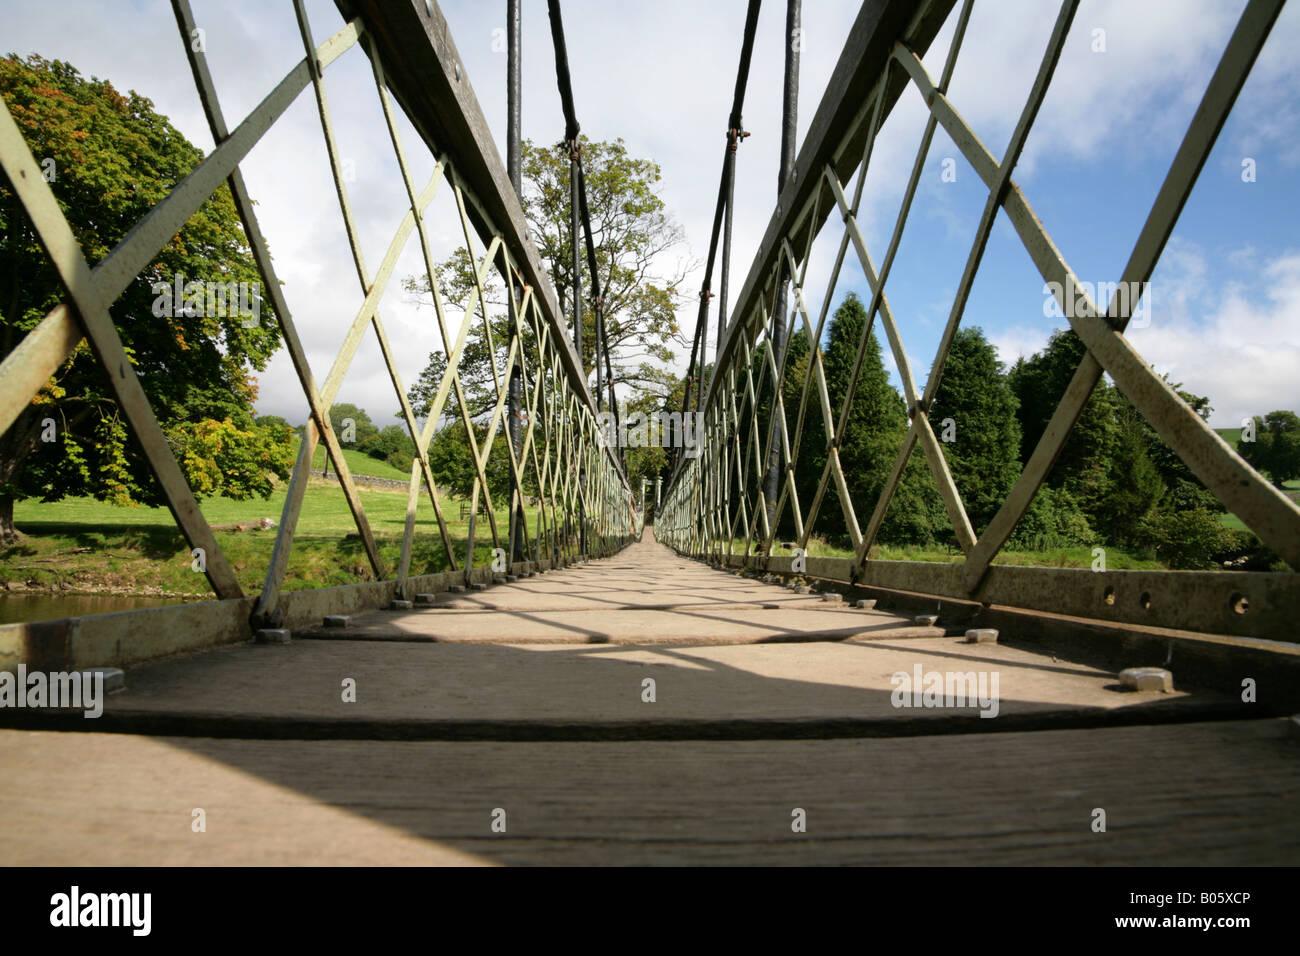 Suspension footbridge over the River Wharfe near Hebden, Yorkshire Dales. Stock Photo